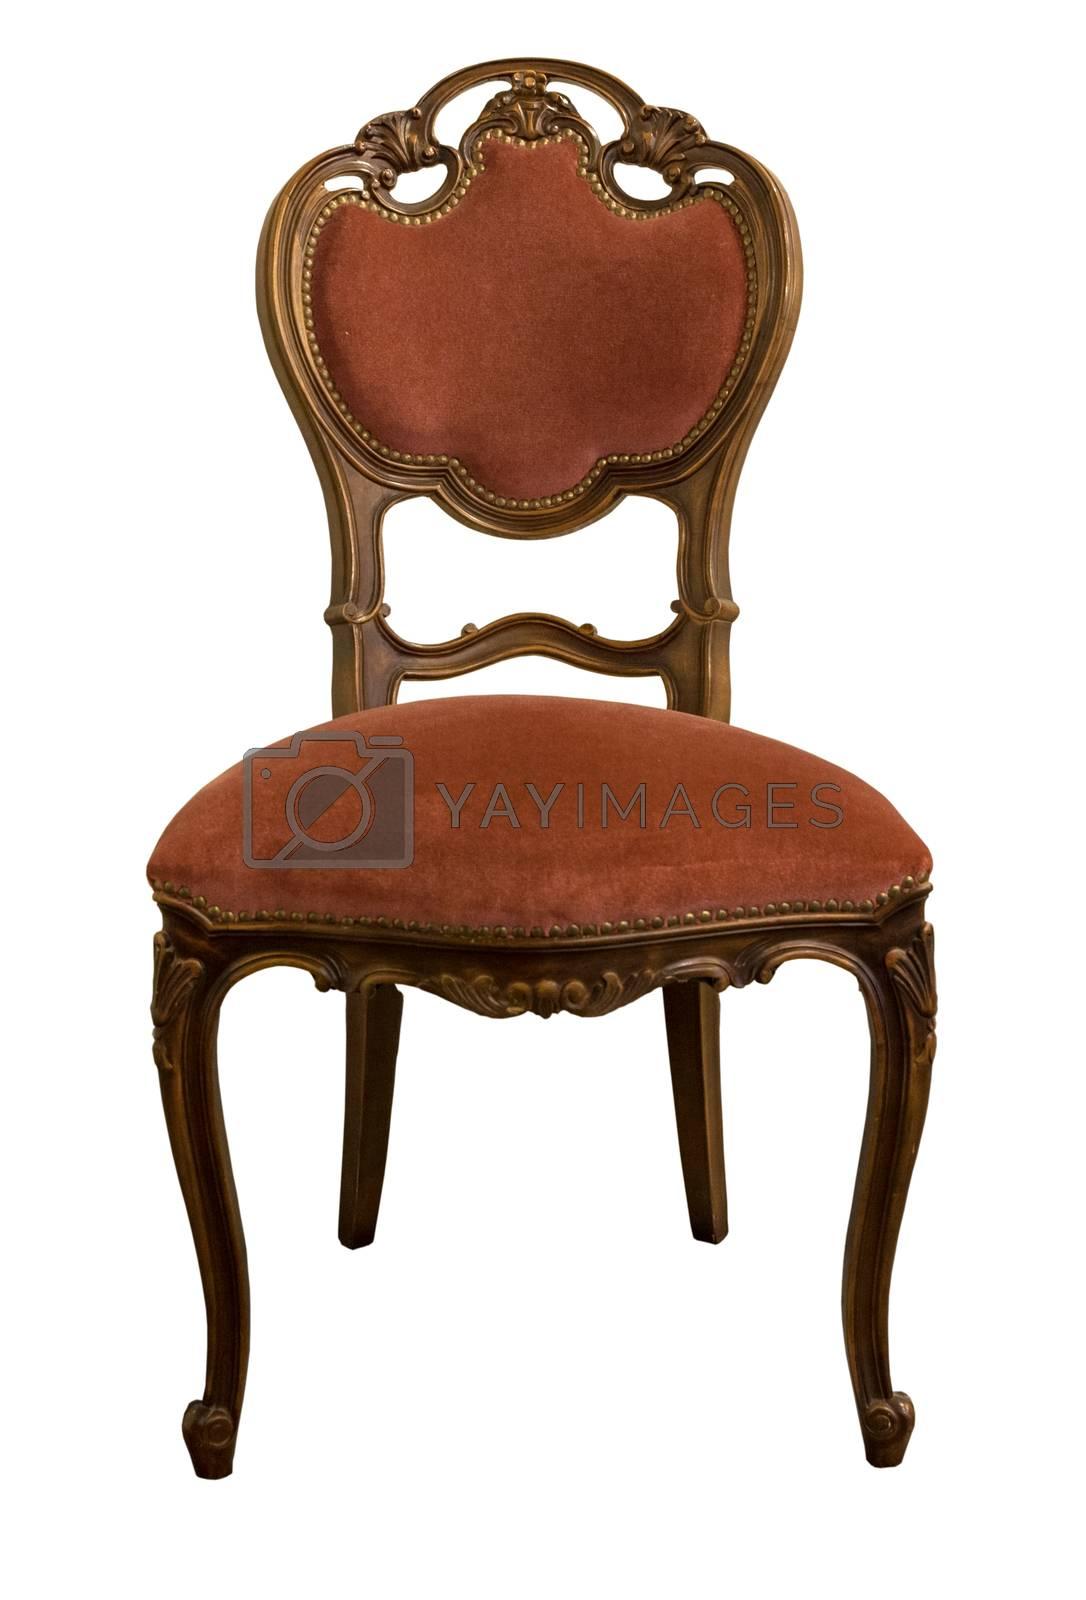 Antique furniture by Nikonas